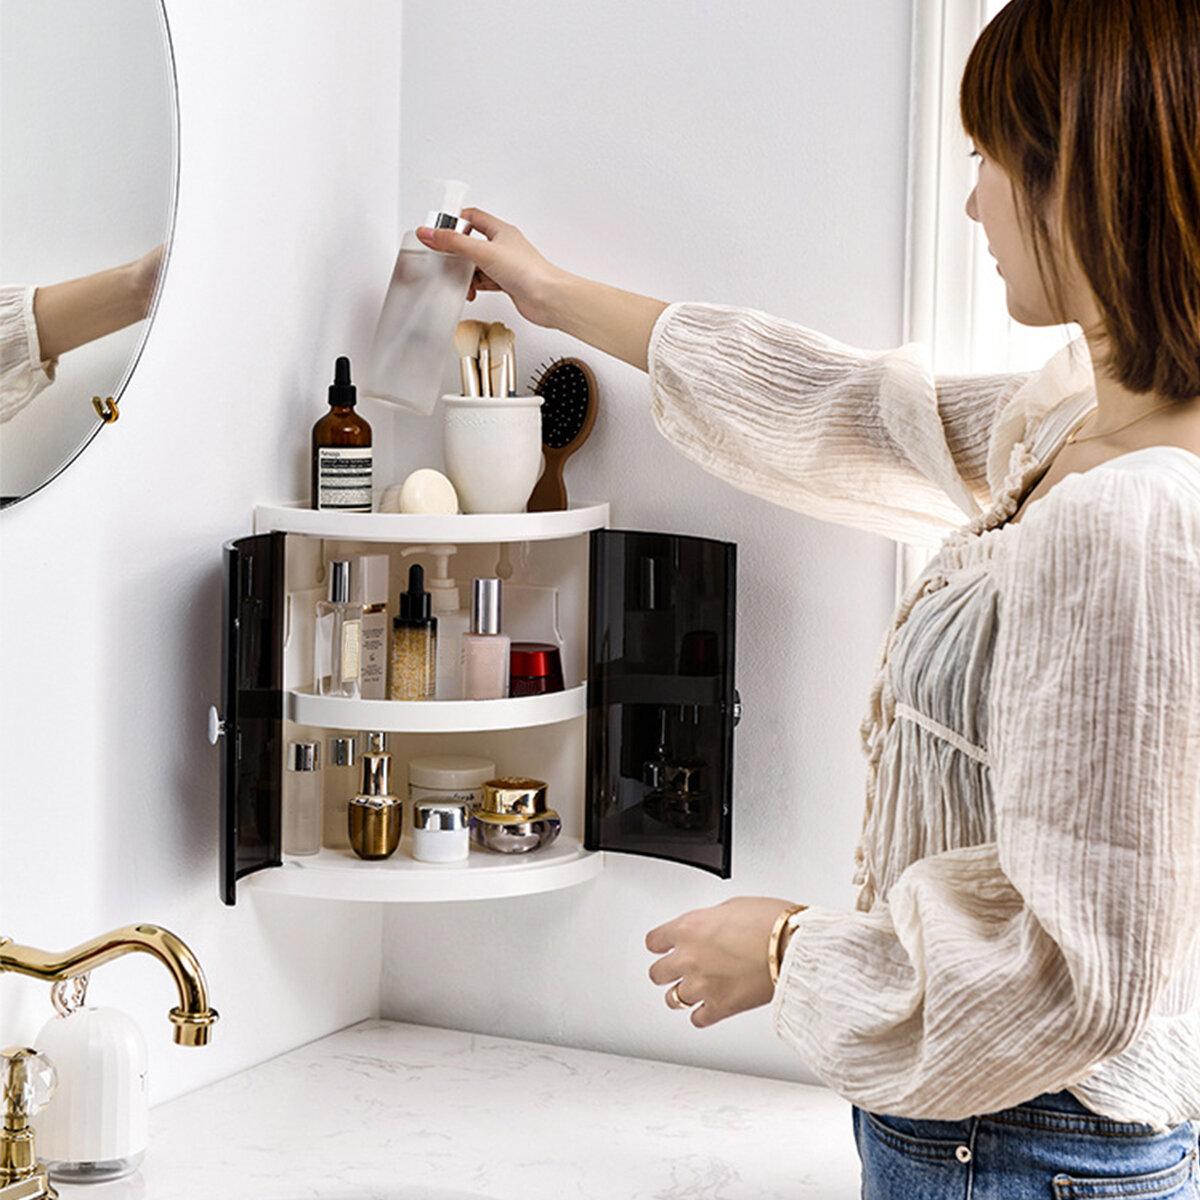 <US Instock> Multifunction 2/3 Tier Corner Storage Organizer Rack Holder Plastic Wall Mounted Shelving Kitchen Bathroom